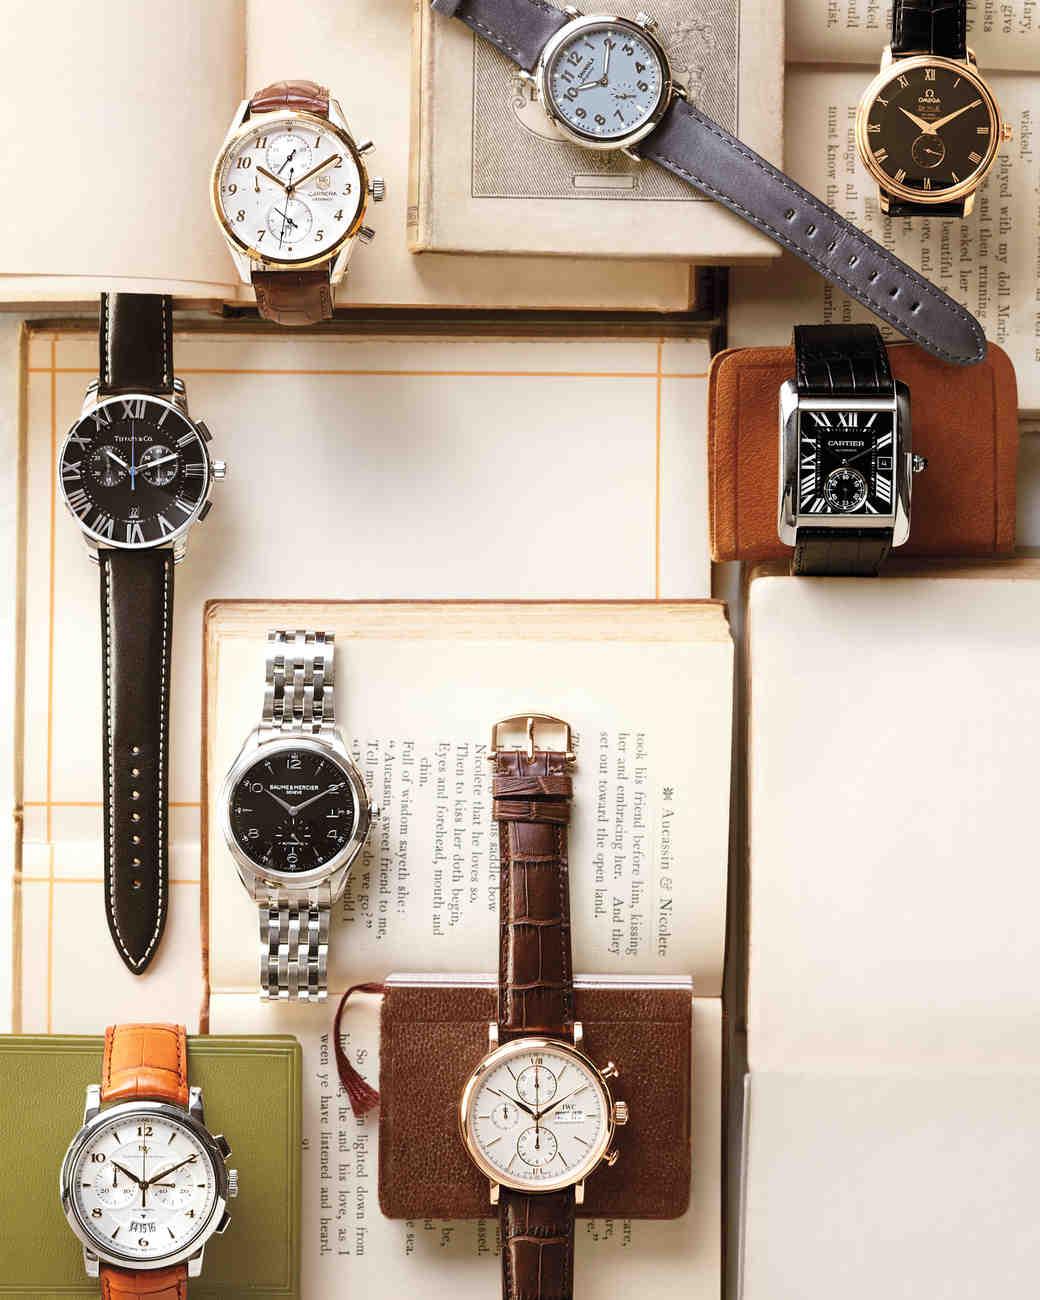 mens-watches-109-exp-2-d111216-comp.jpg